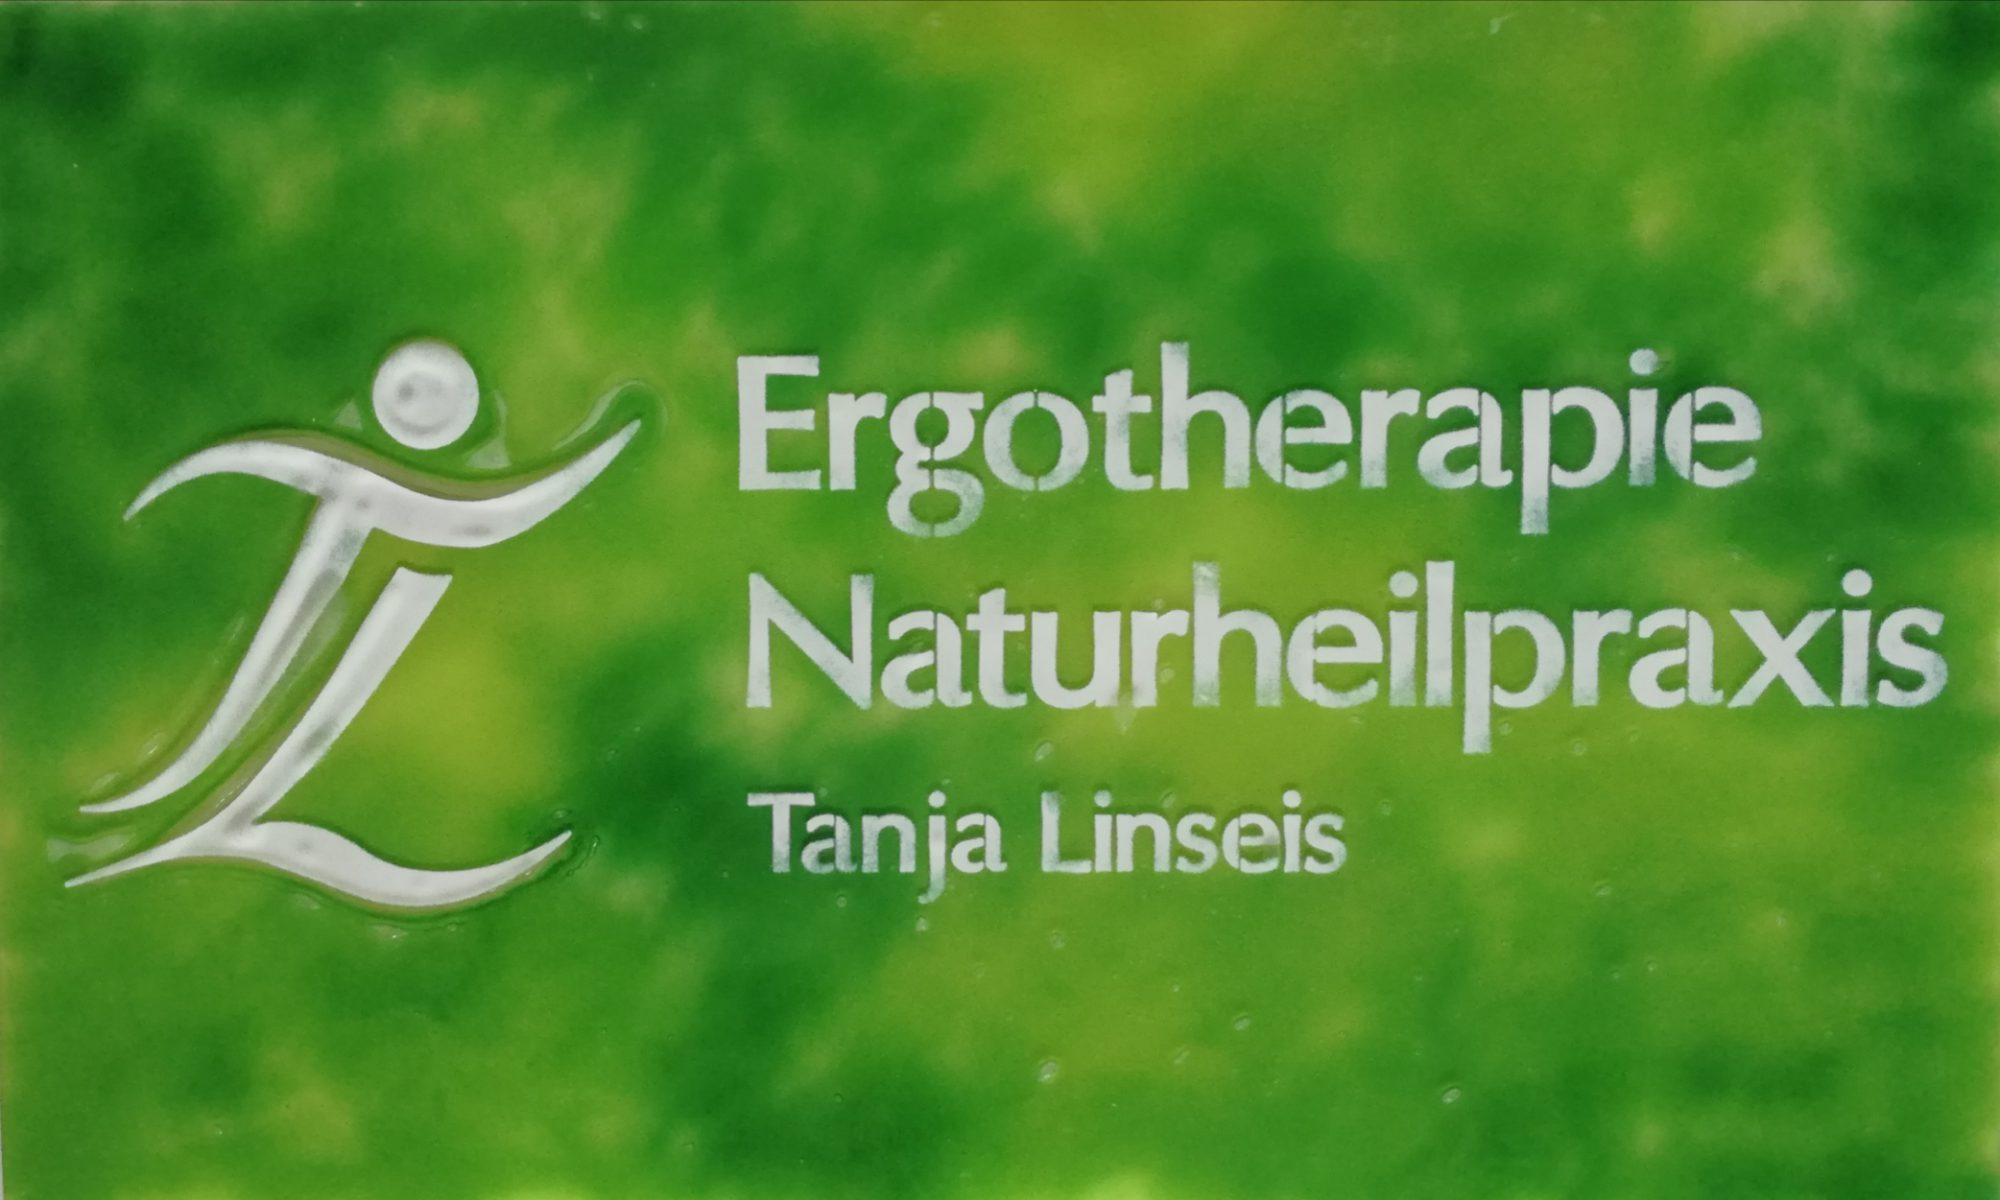 Ergotherapie und Naturheilpraxis Tanja Linseis